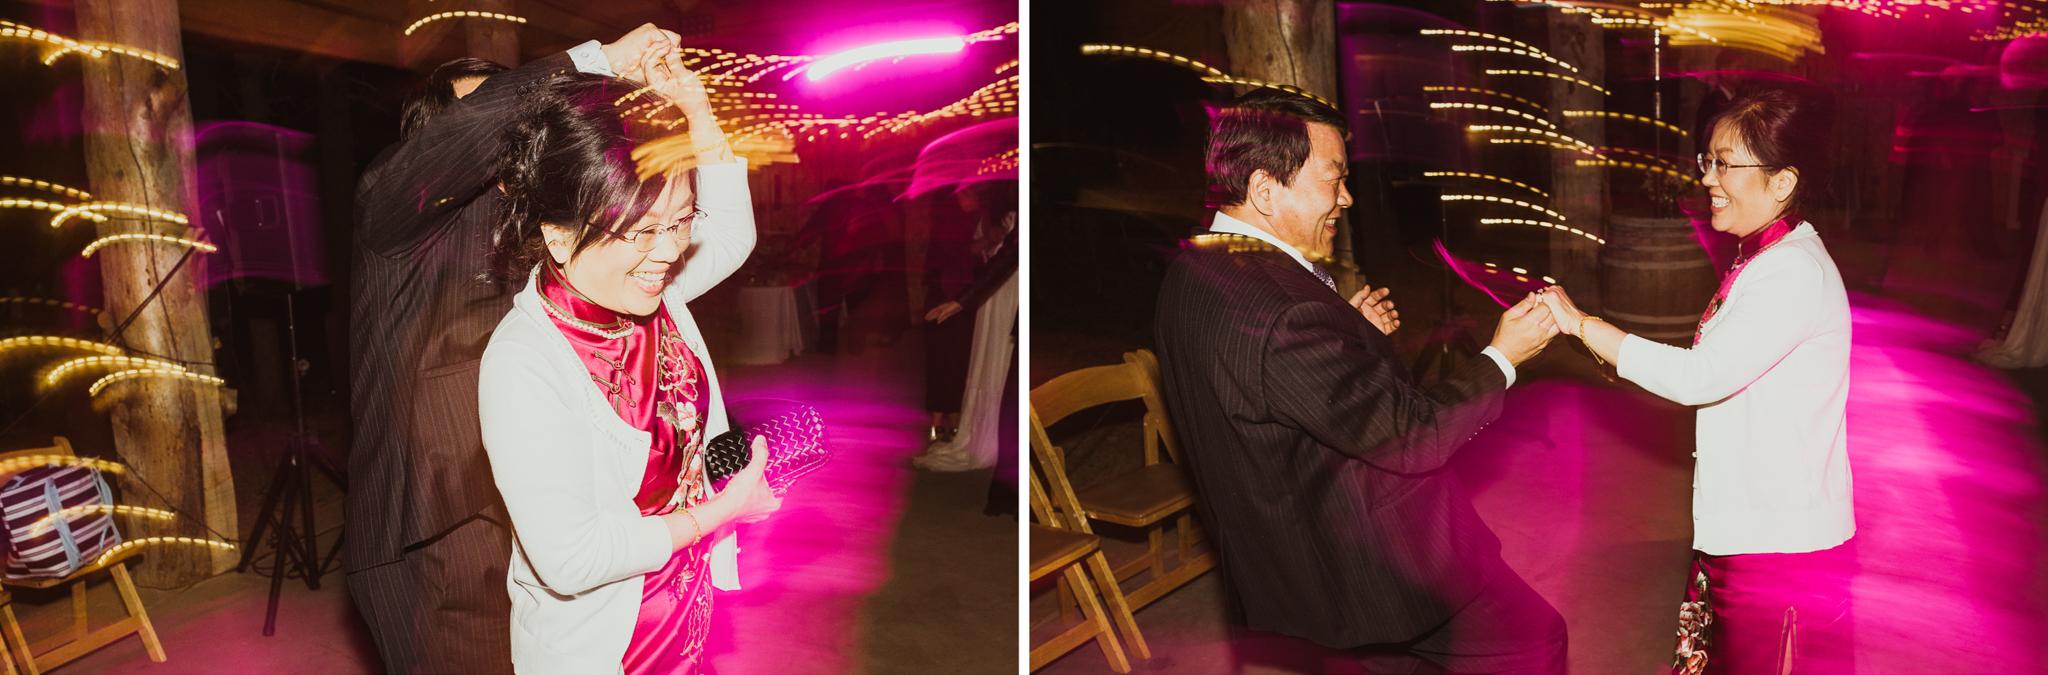 ©Isaiah & Taylor Photography - The Hideout, Kirkwood CA wedding -8.jpg